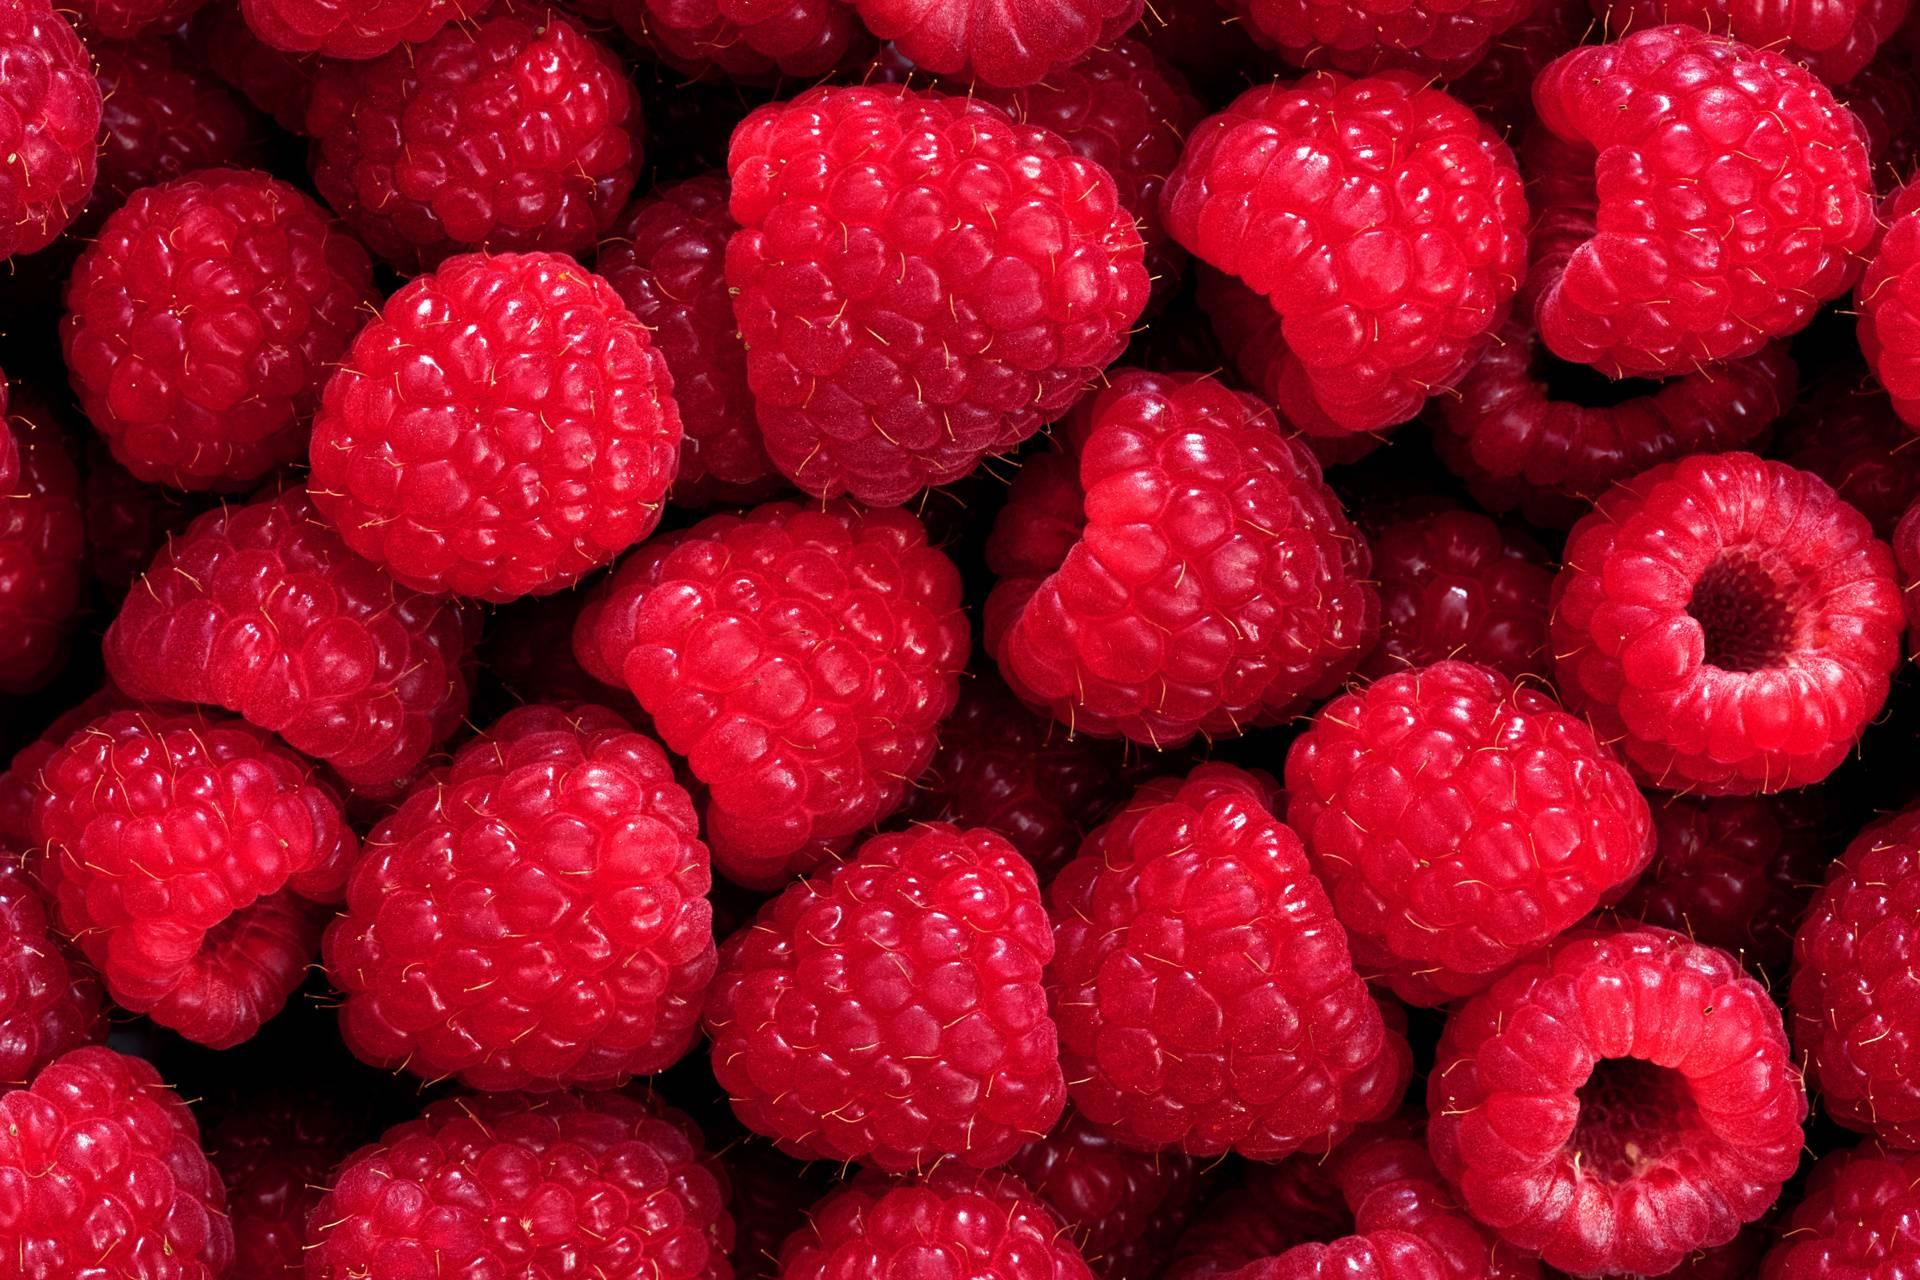 Rasberry wallpaper by nudge78 - 14 - Free on ZEDGE™